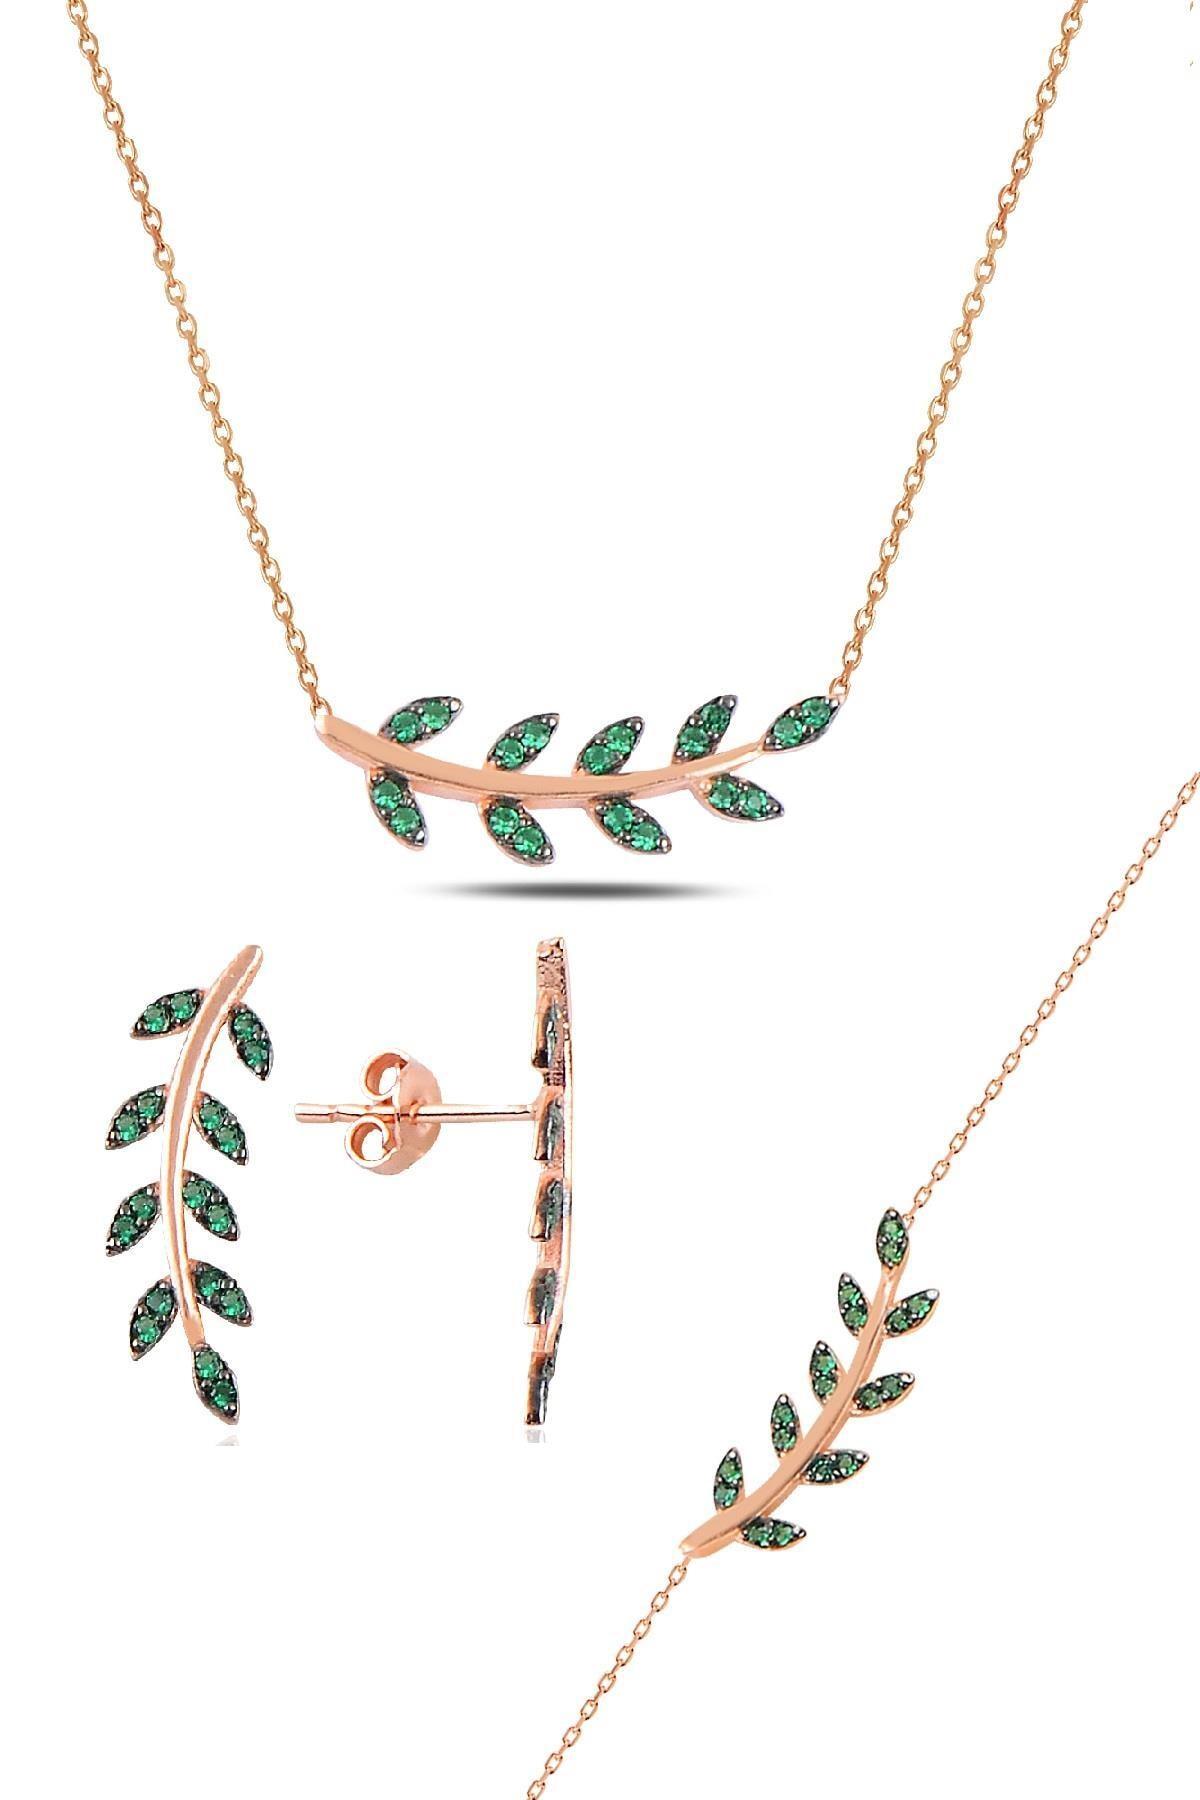 Söğütlü Silver Gümüş rose yeşil  taşlı yaprak  üçlü set 0